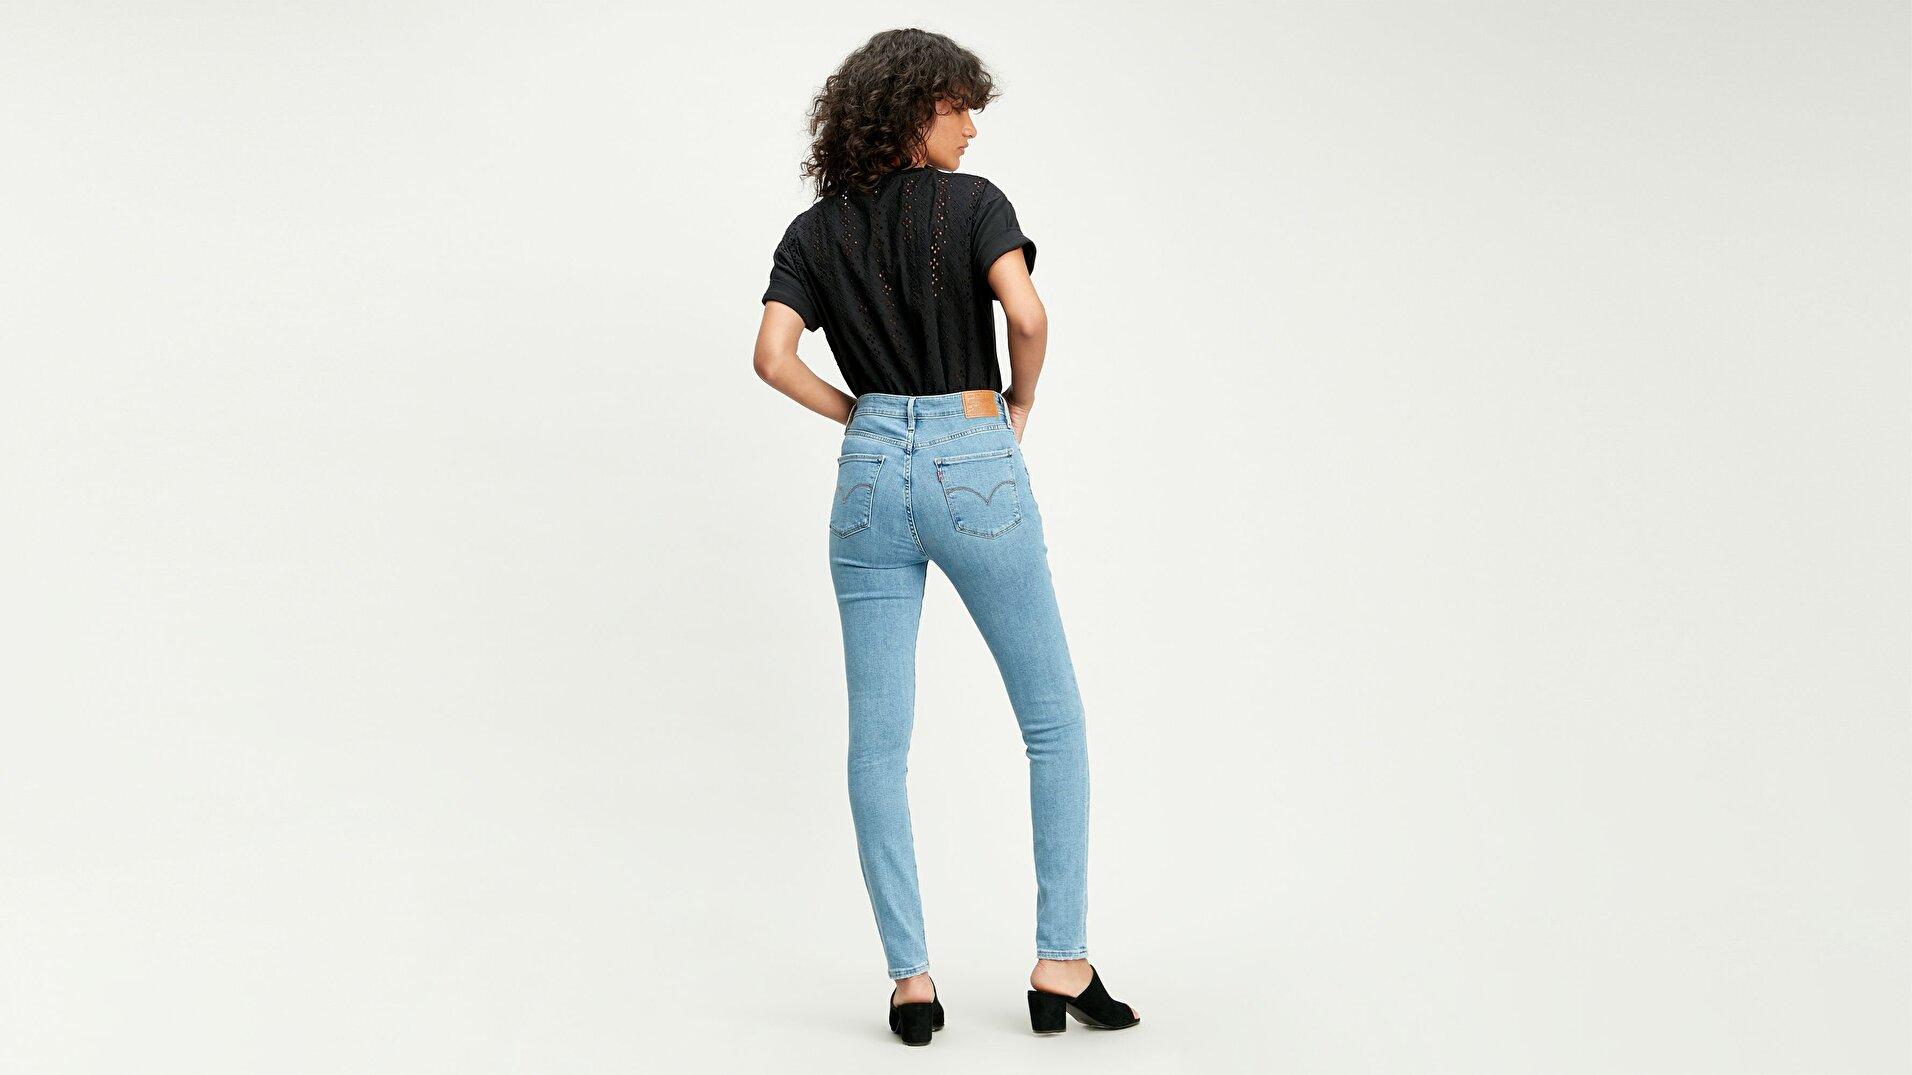 721 Yüksel Bel Skinny Fit Kadın Jean Pantolon-Have A Nice Day